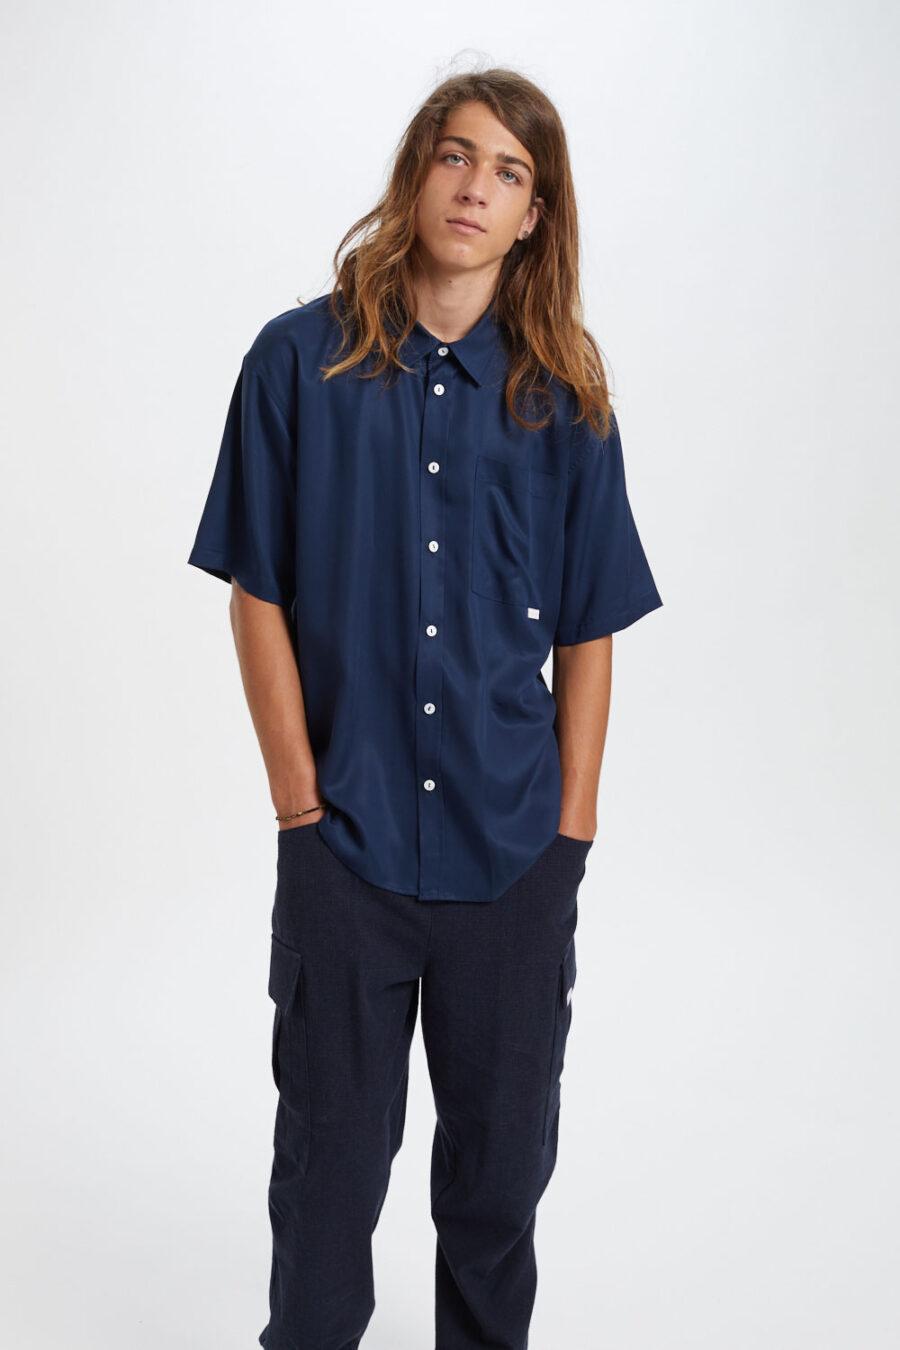 Amado Shirt Navy